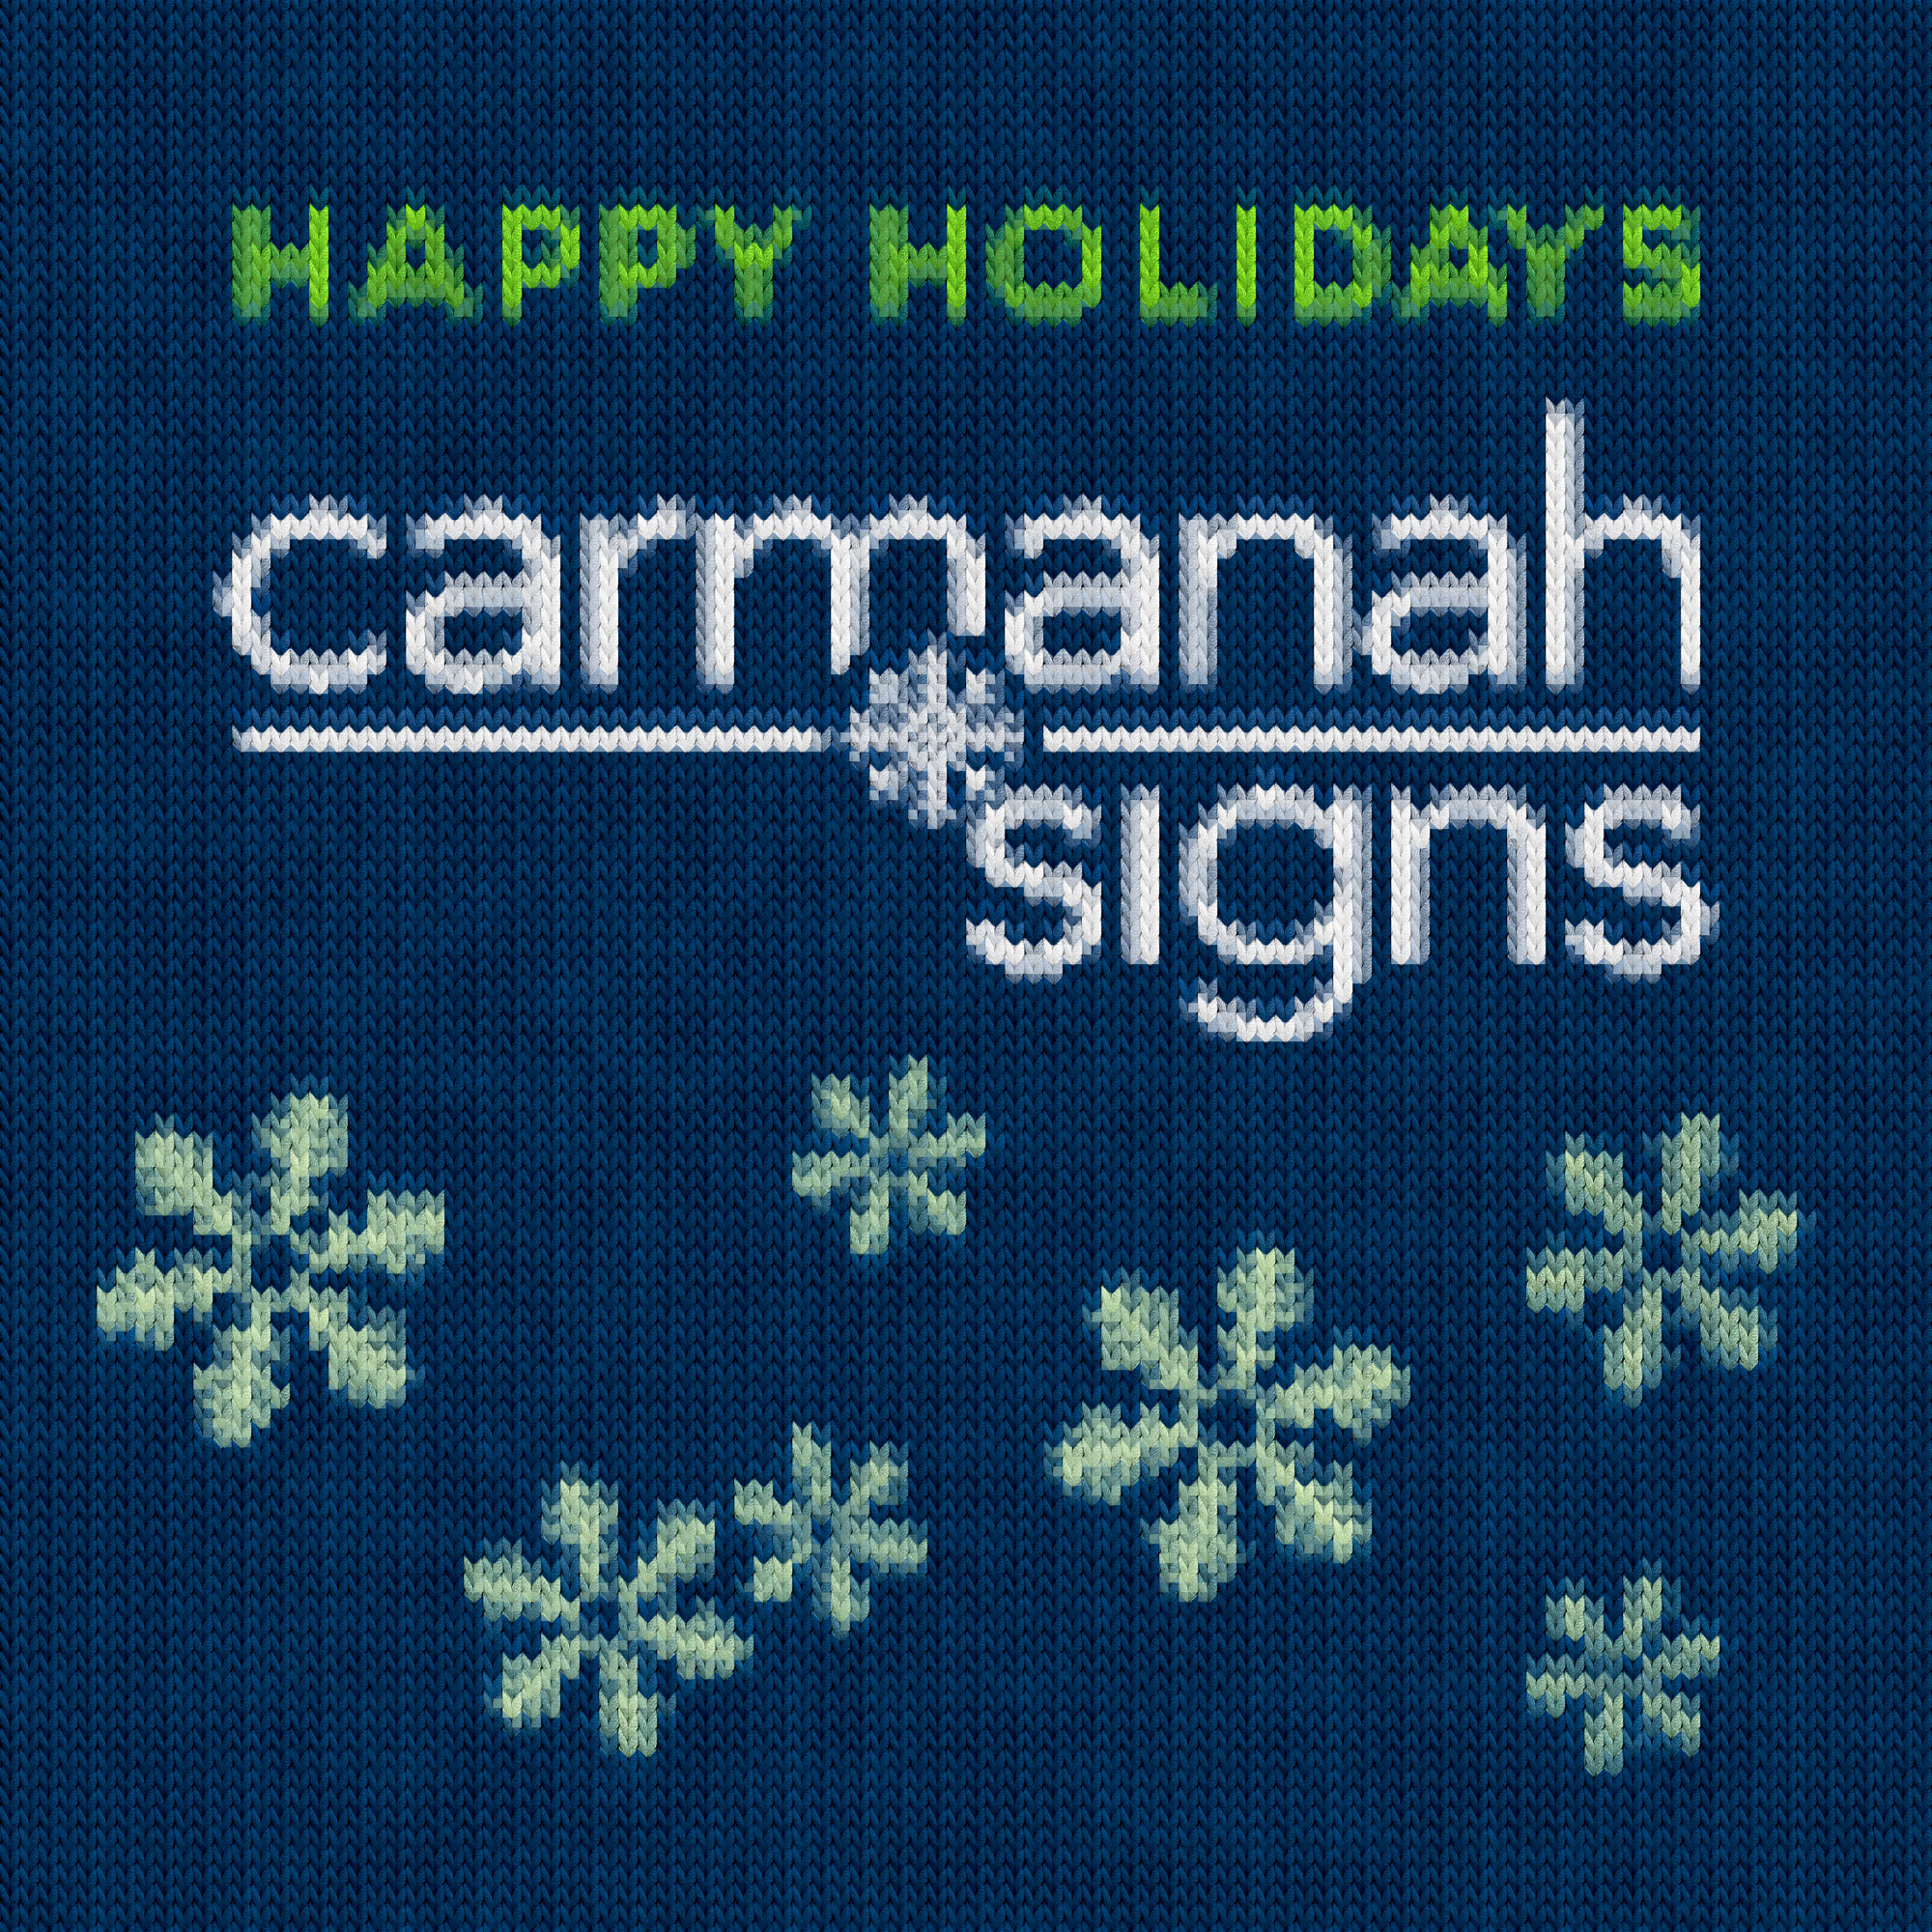 Carmanah-Christmas-Sweater-Knit-V0.5.jpg